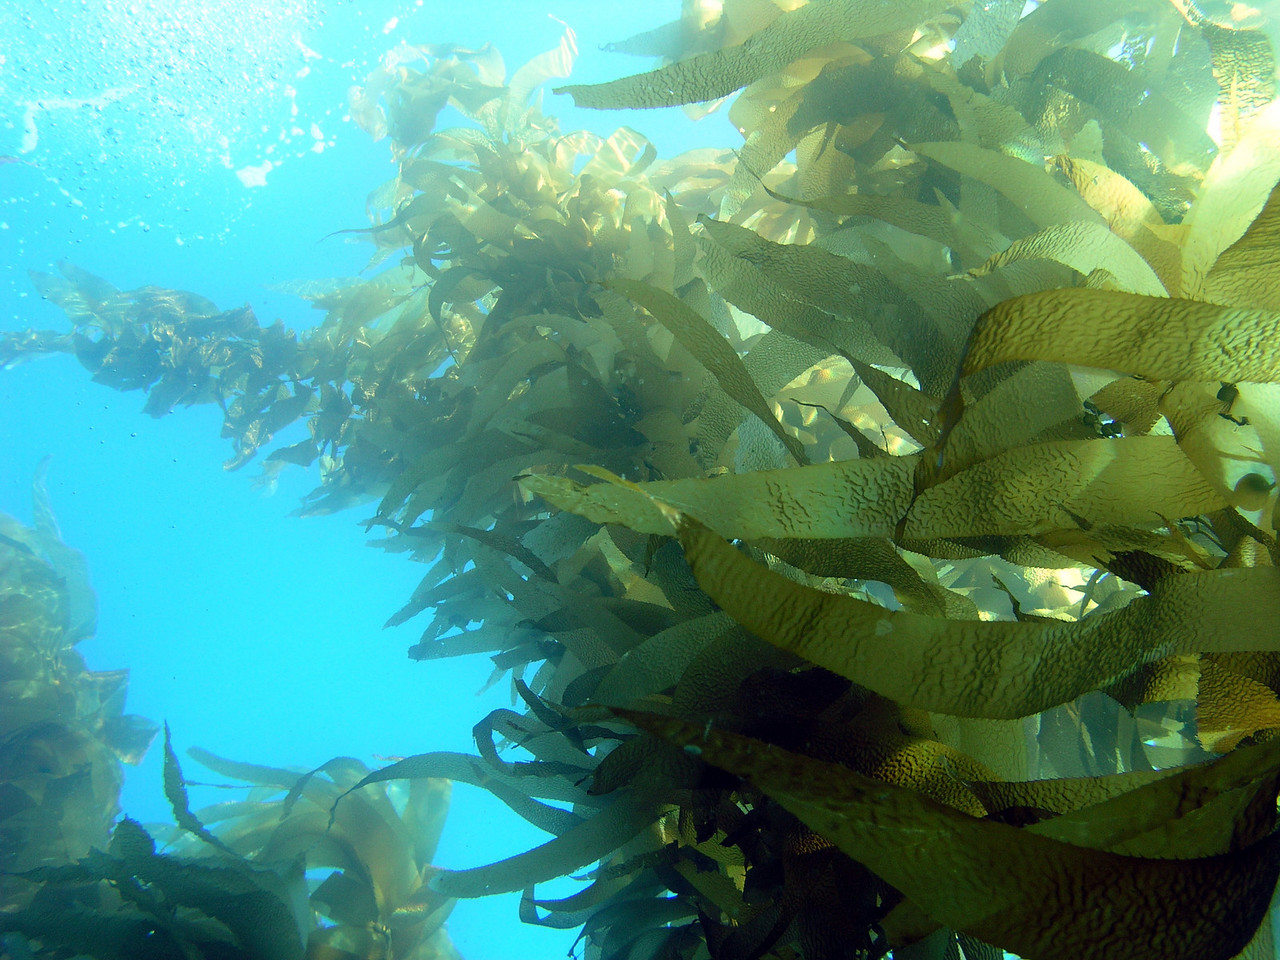 kelpstalk